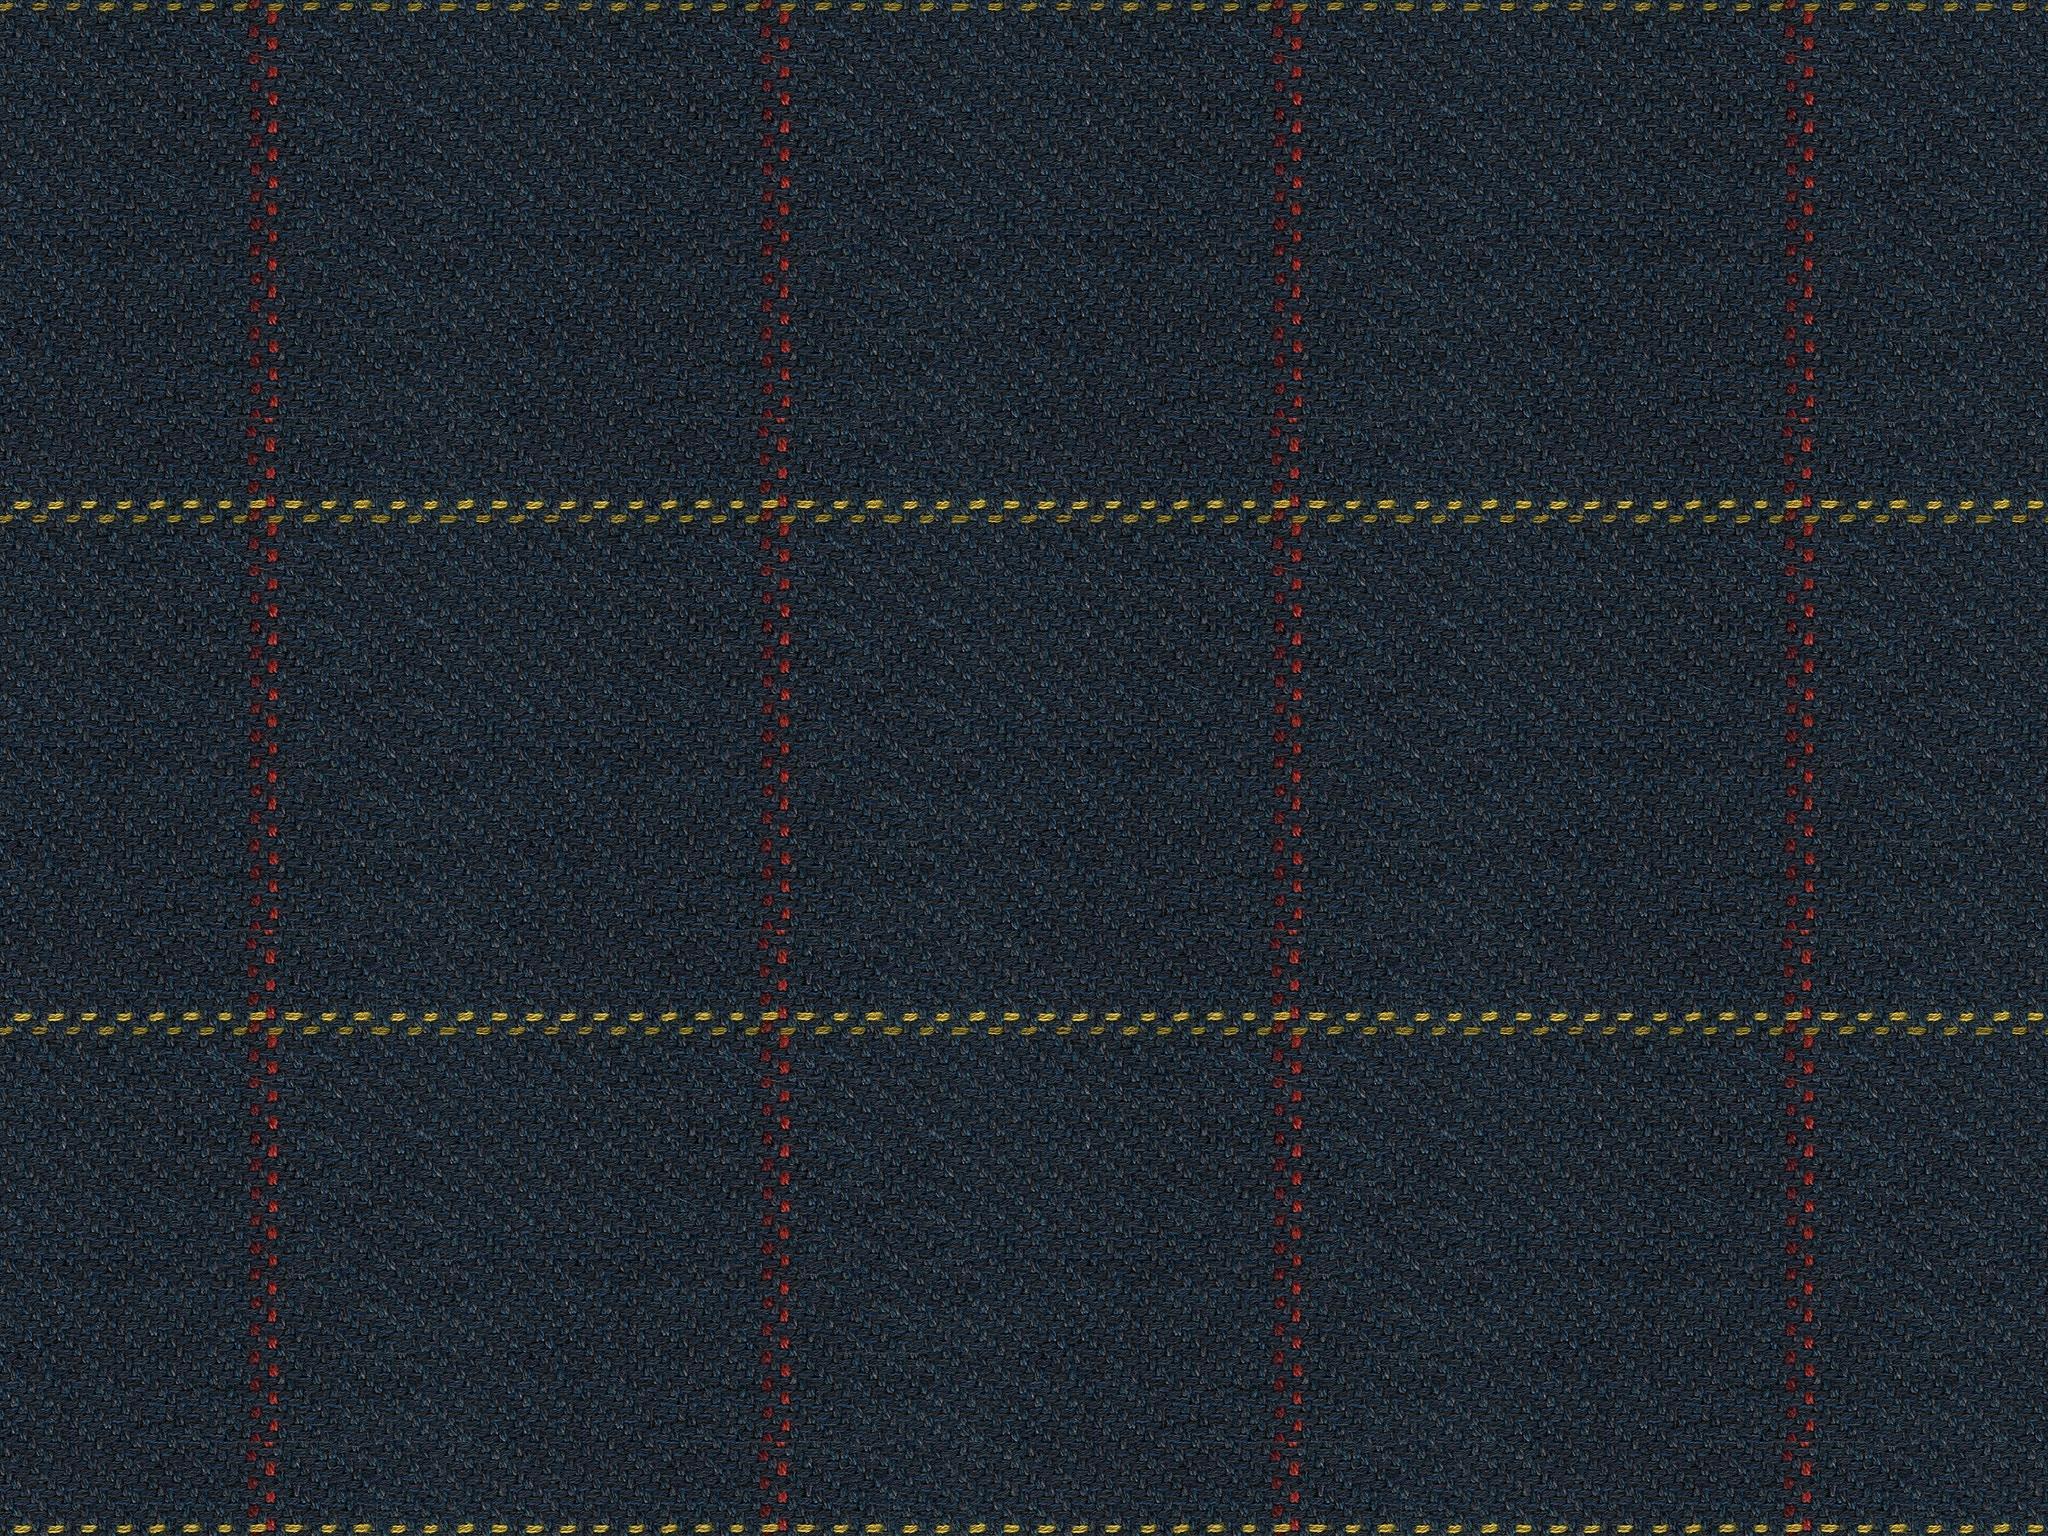 Bassett Woven Plaid Navy 2431 5 Woodchucks Fine